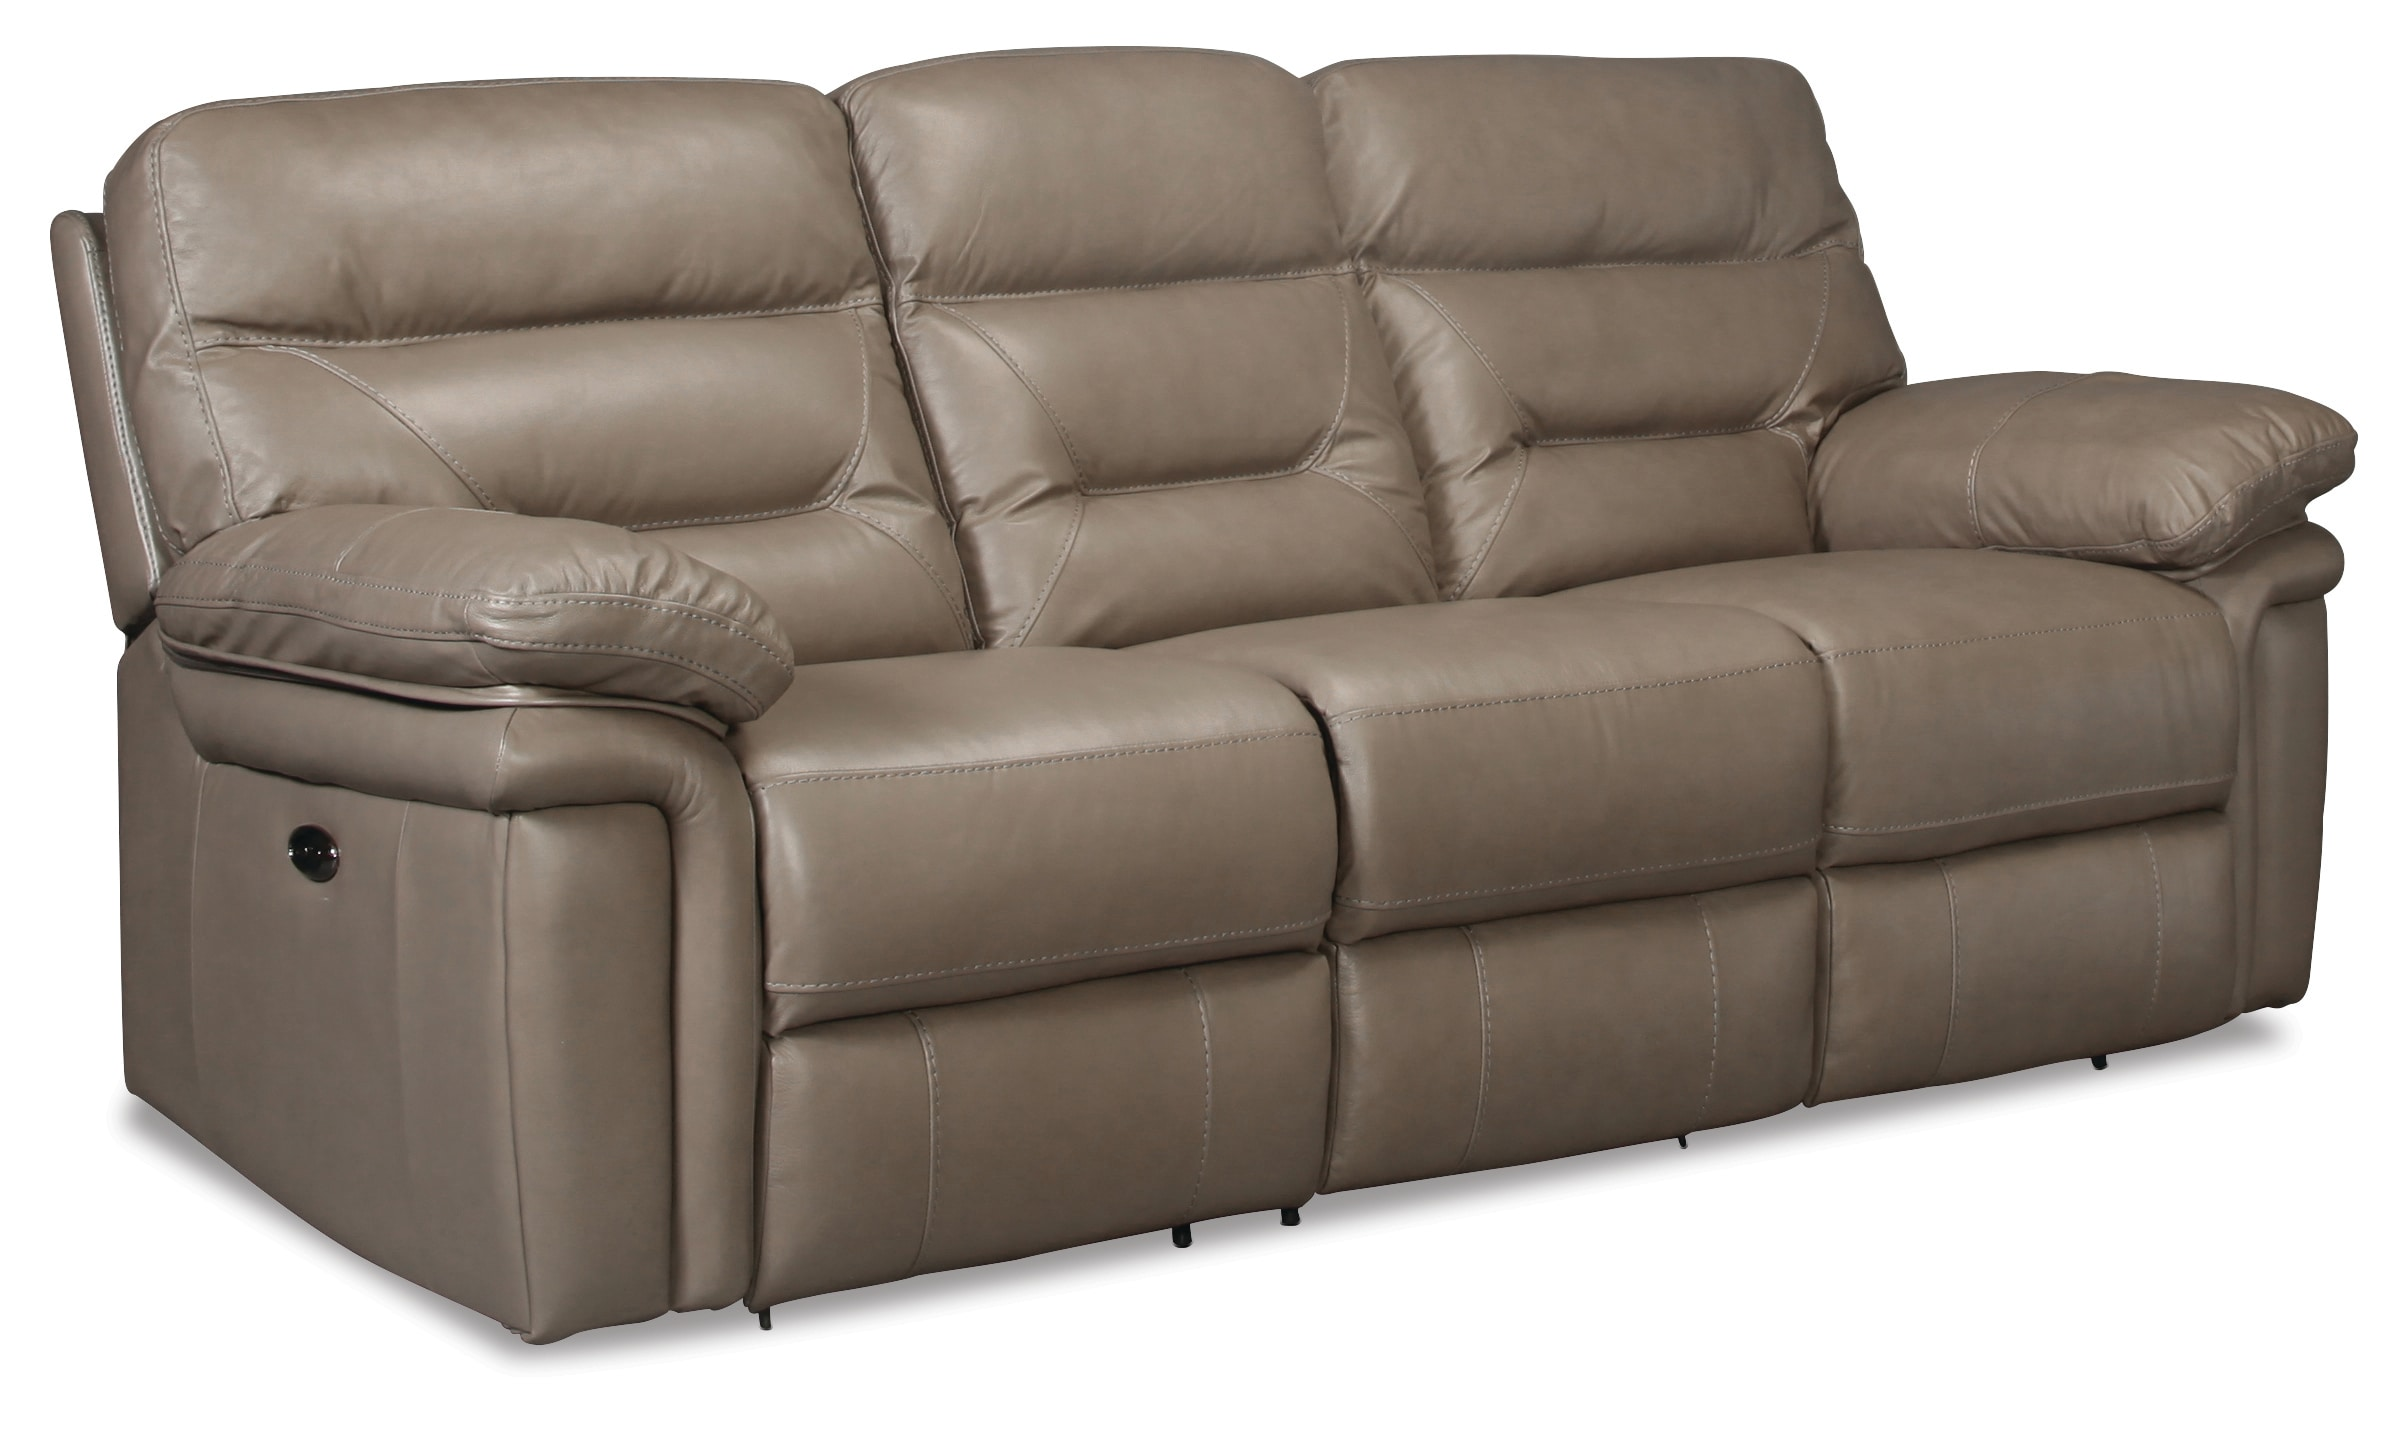 Piper Power Reclining Sofa Levin Furniture